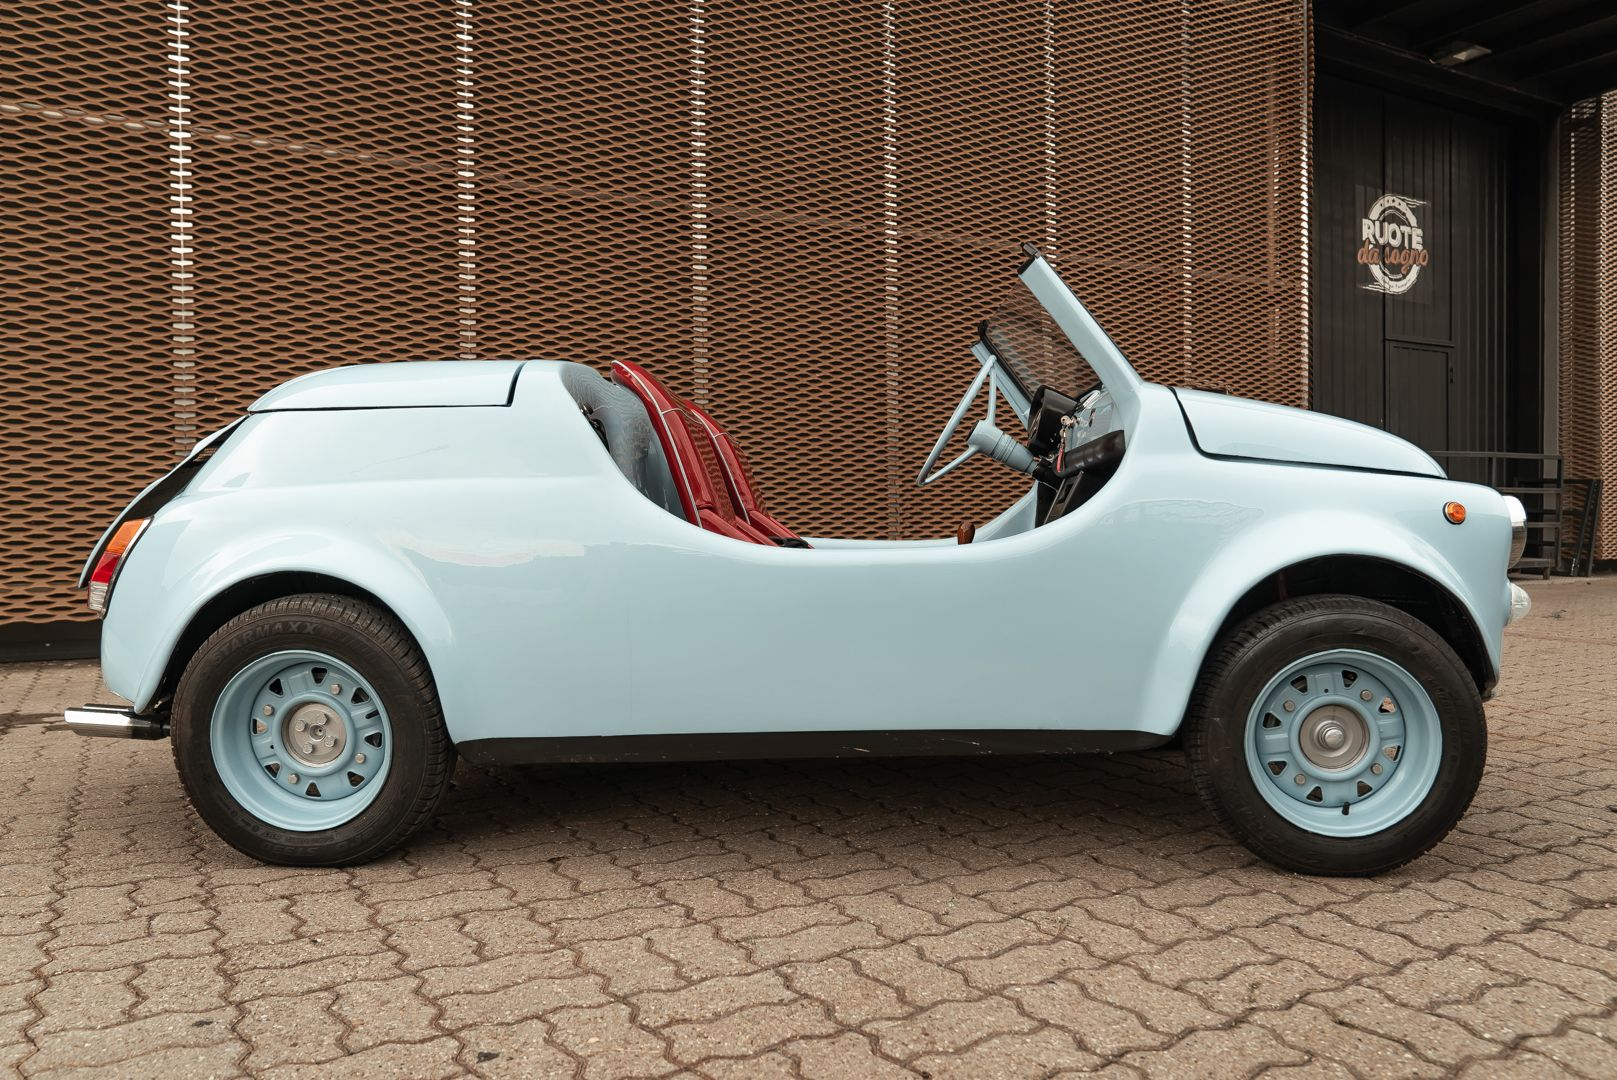 1971 Fiat 500 F Replica Speedster 80050